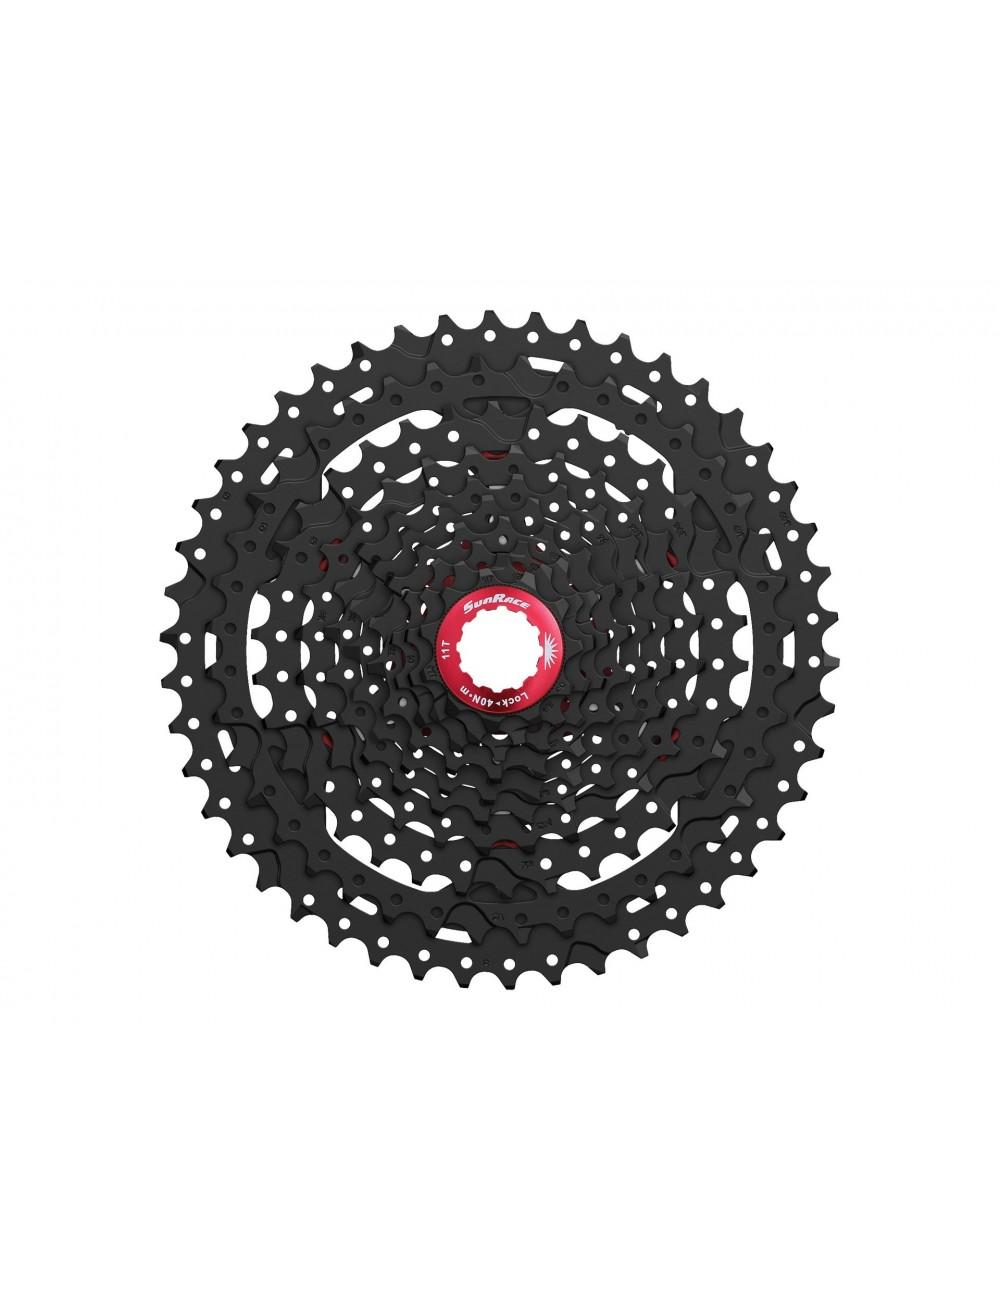 CASSETE SUN RACE 10v 11-46 Metalic/Red CSMX3